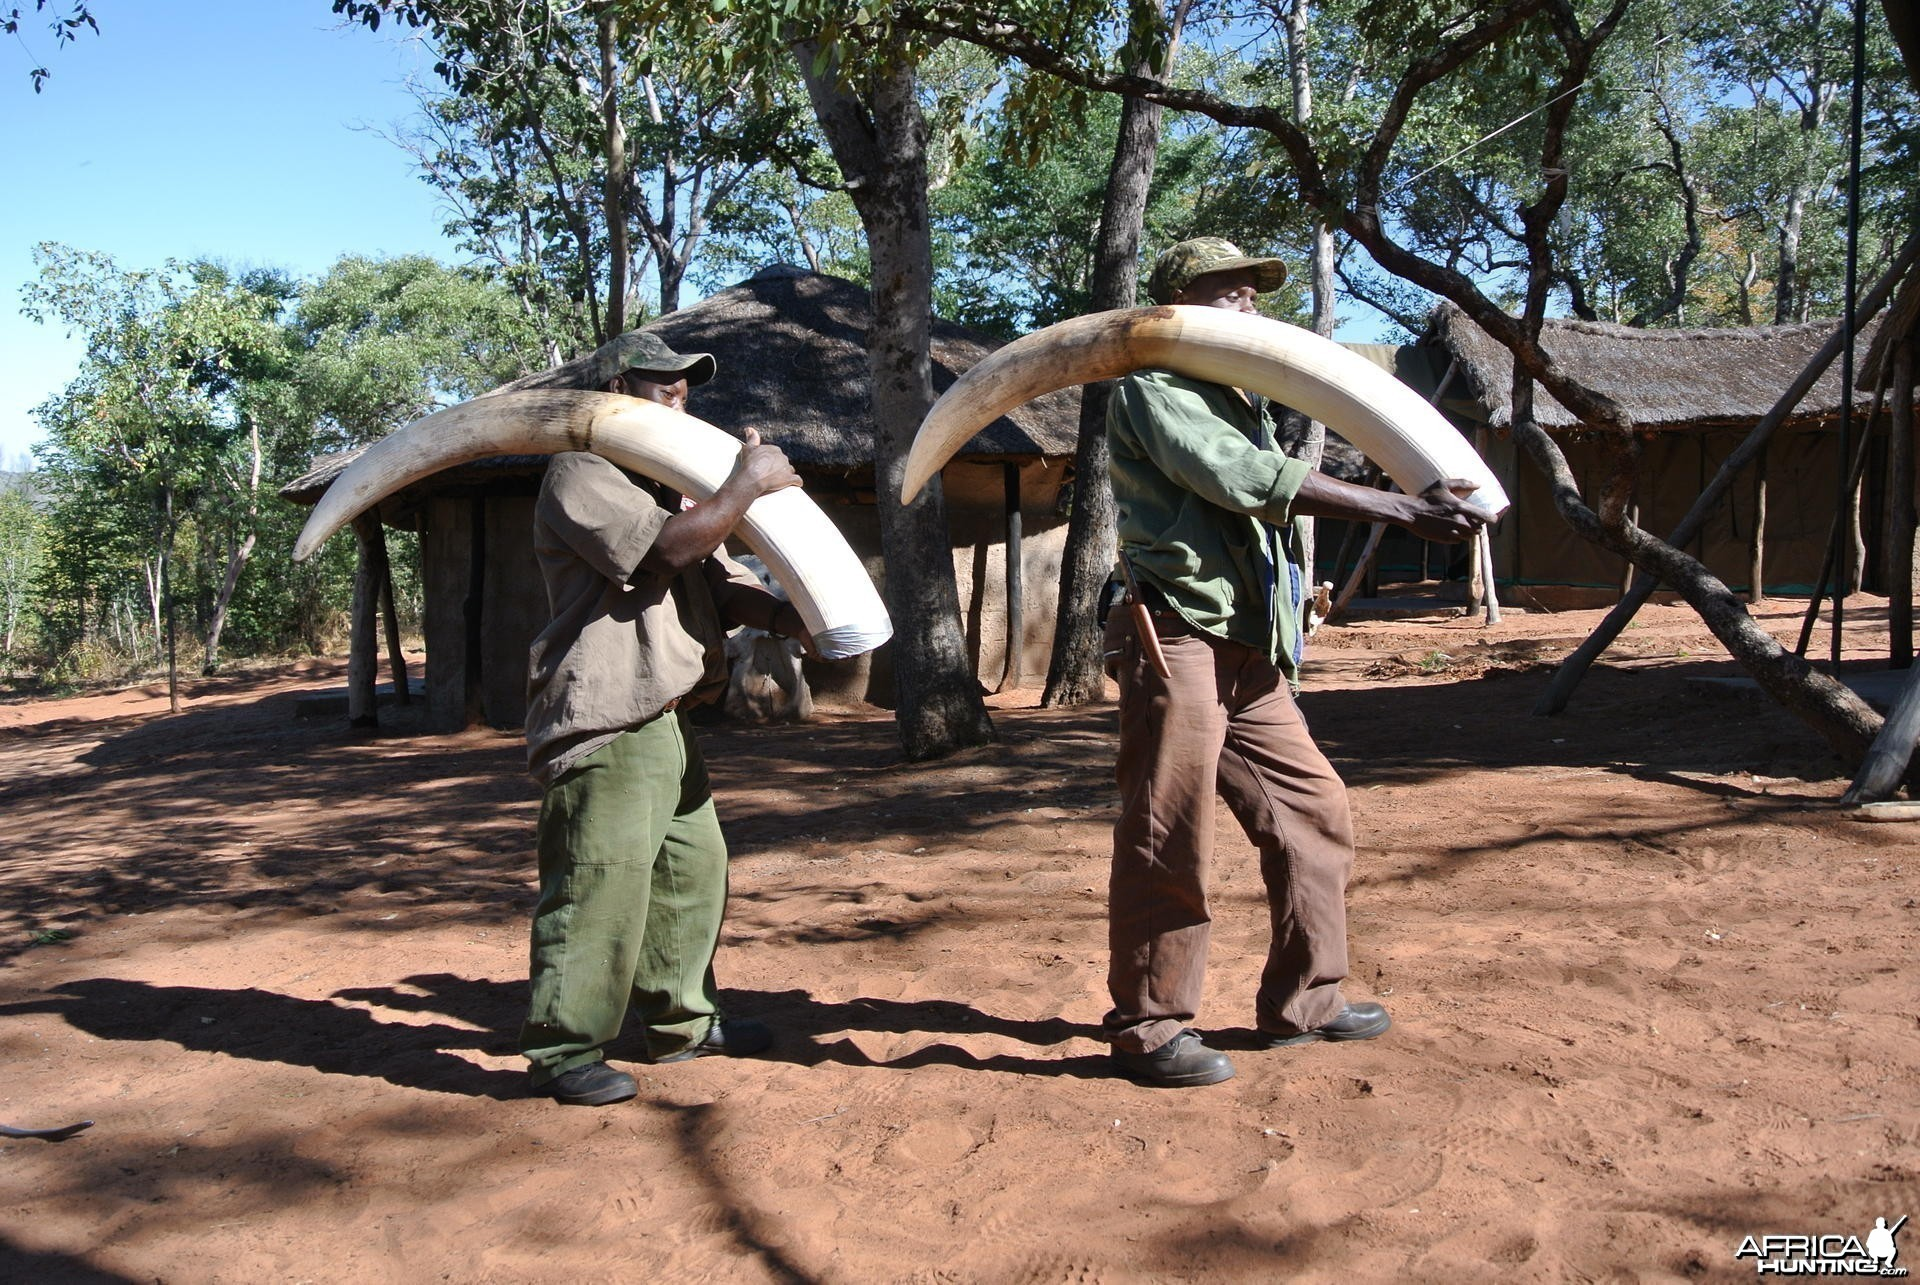 52 pound Elephant Bull